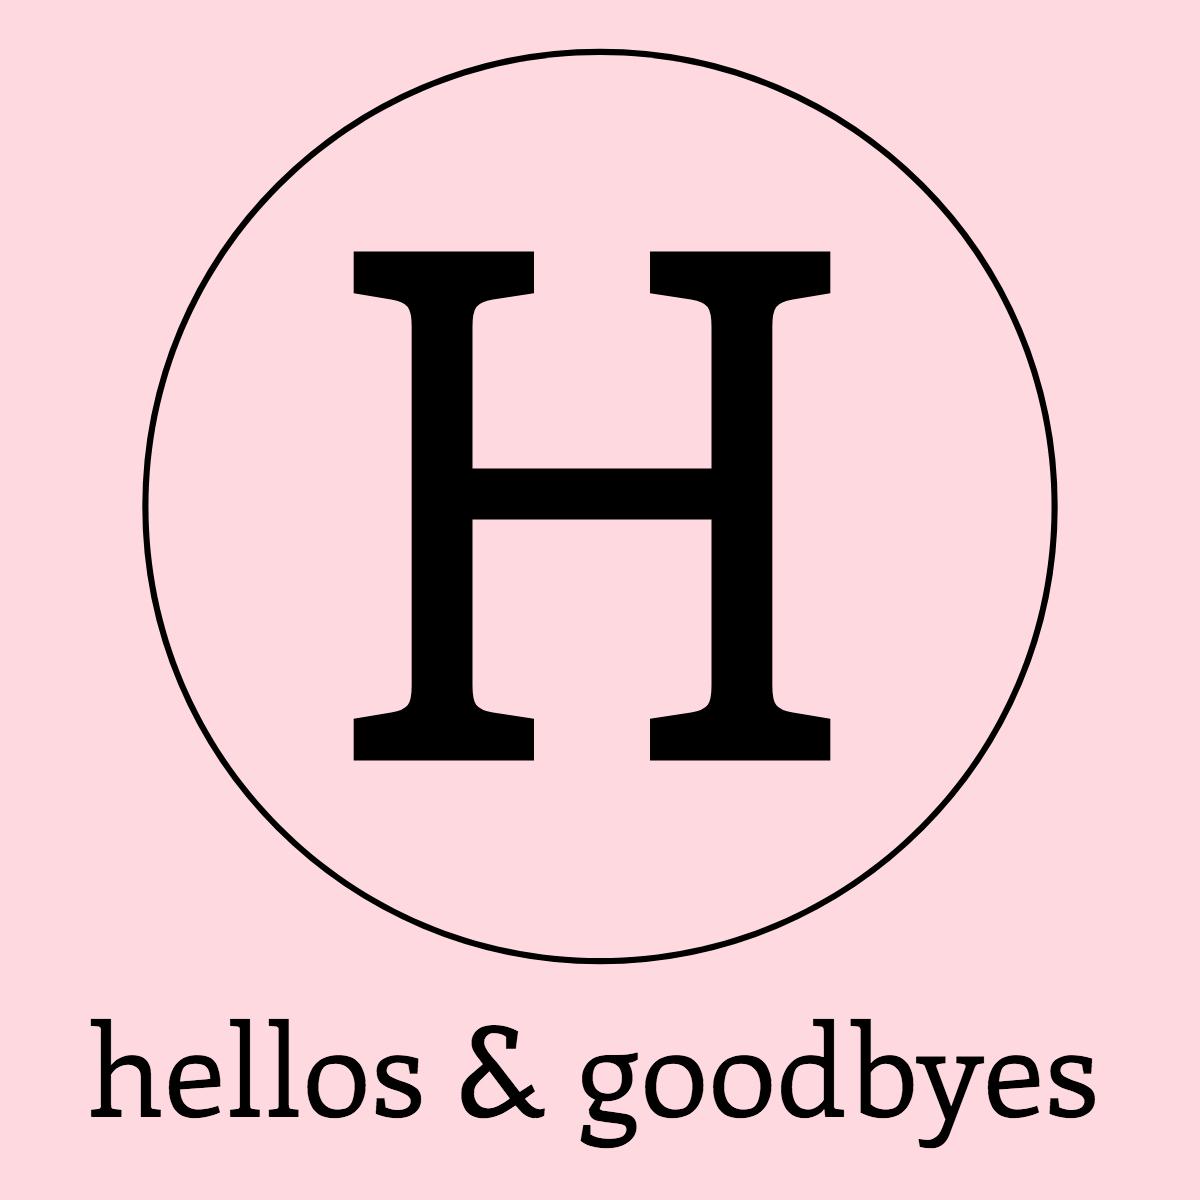 hellos & goodbyes.jpg